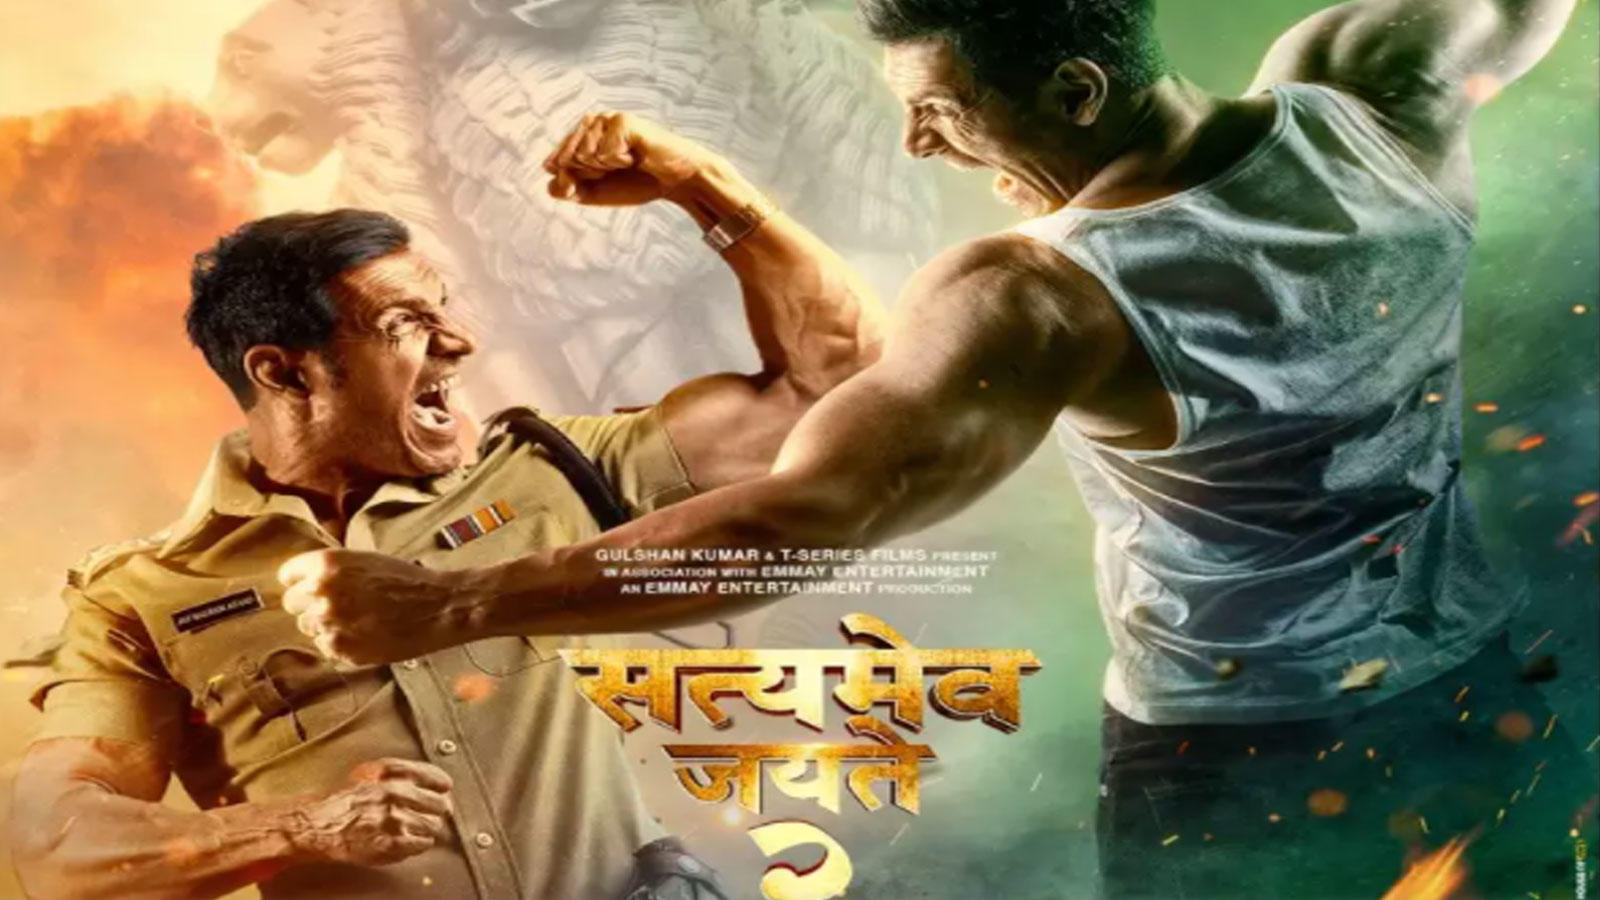 Satyameva Jayate 2: John Abraham and Divya Khosla Kumar's action thriller's release gets postponed | Hindi Movie News – Bollywood – Times of India